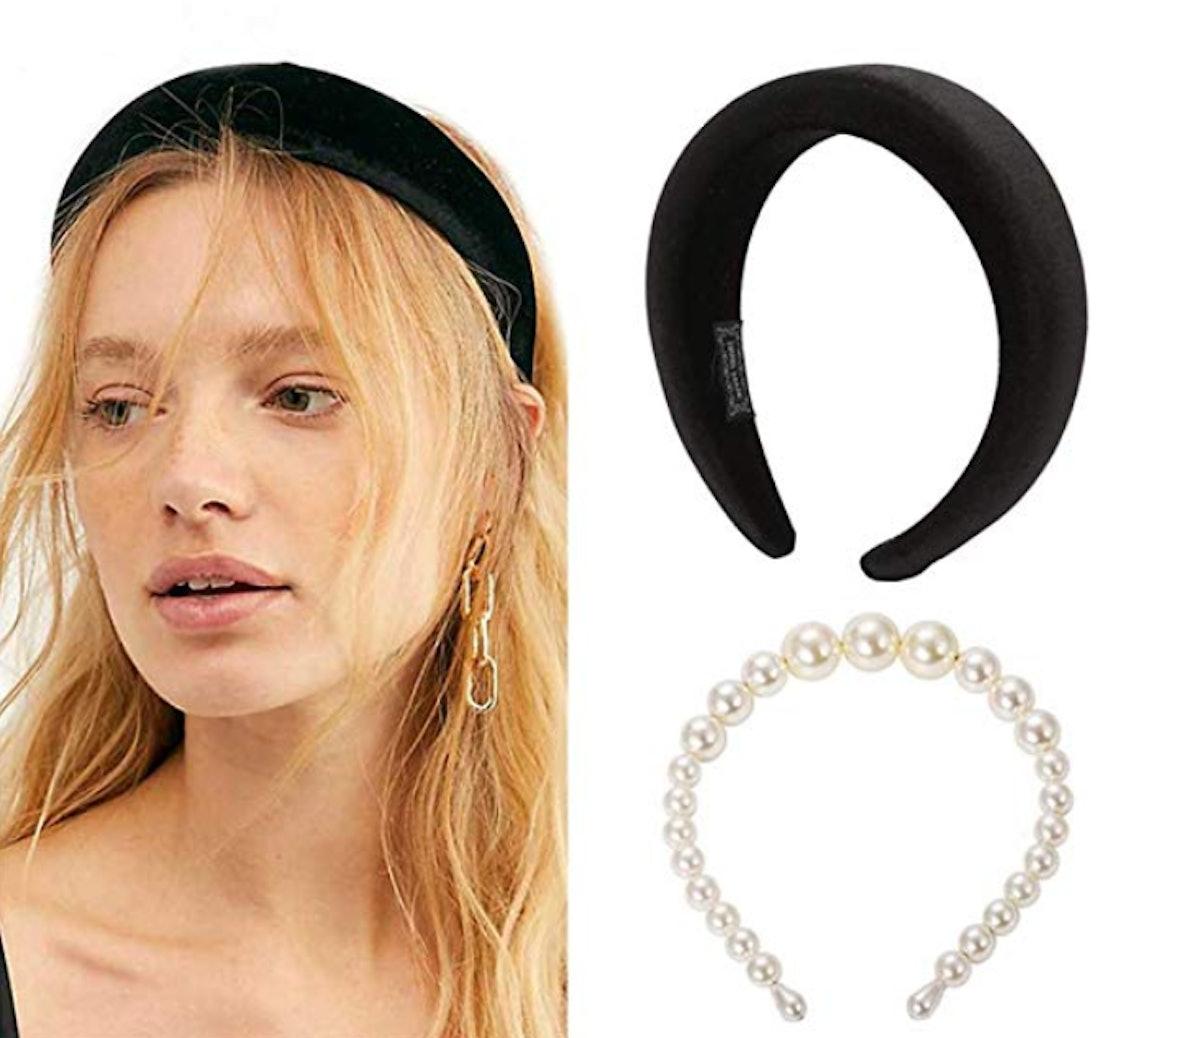 POPINK Womens Padded Headbands